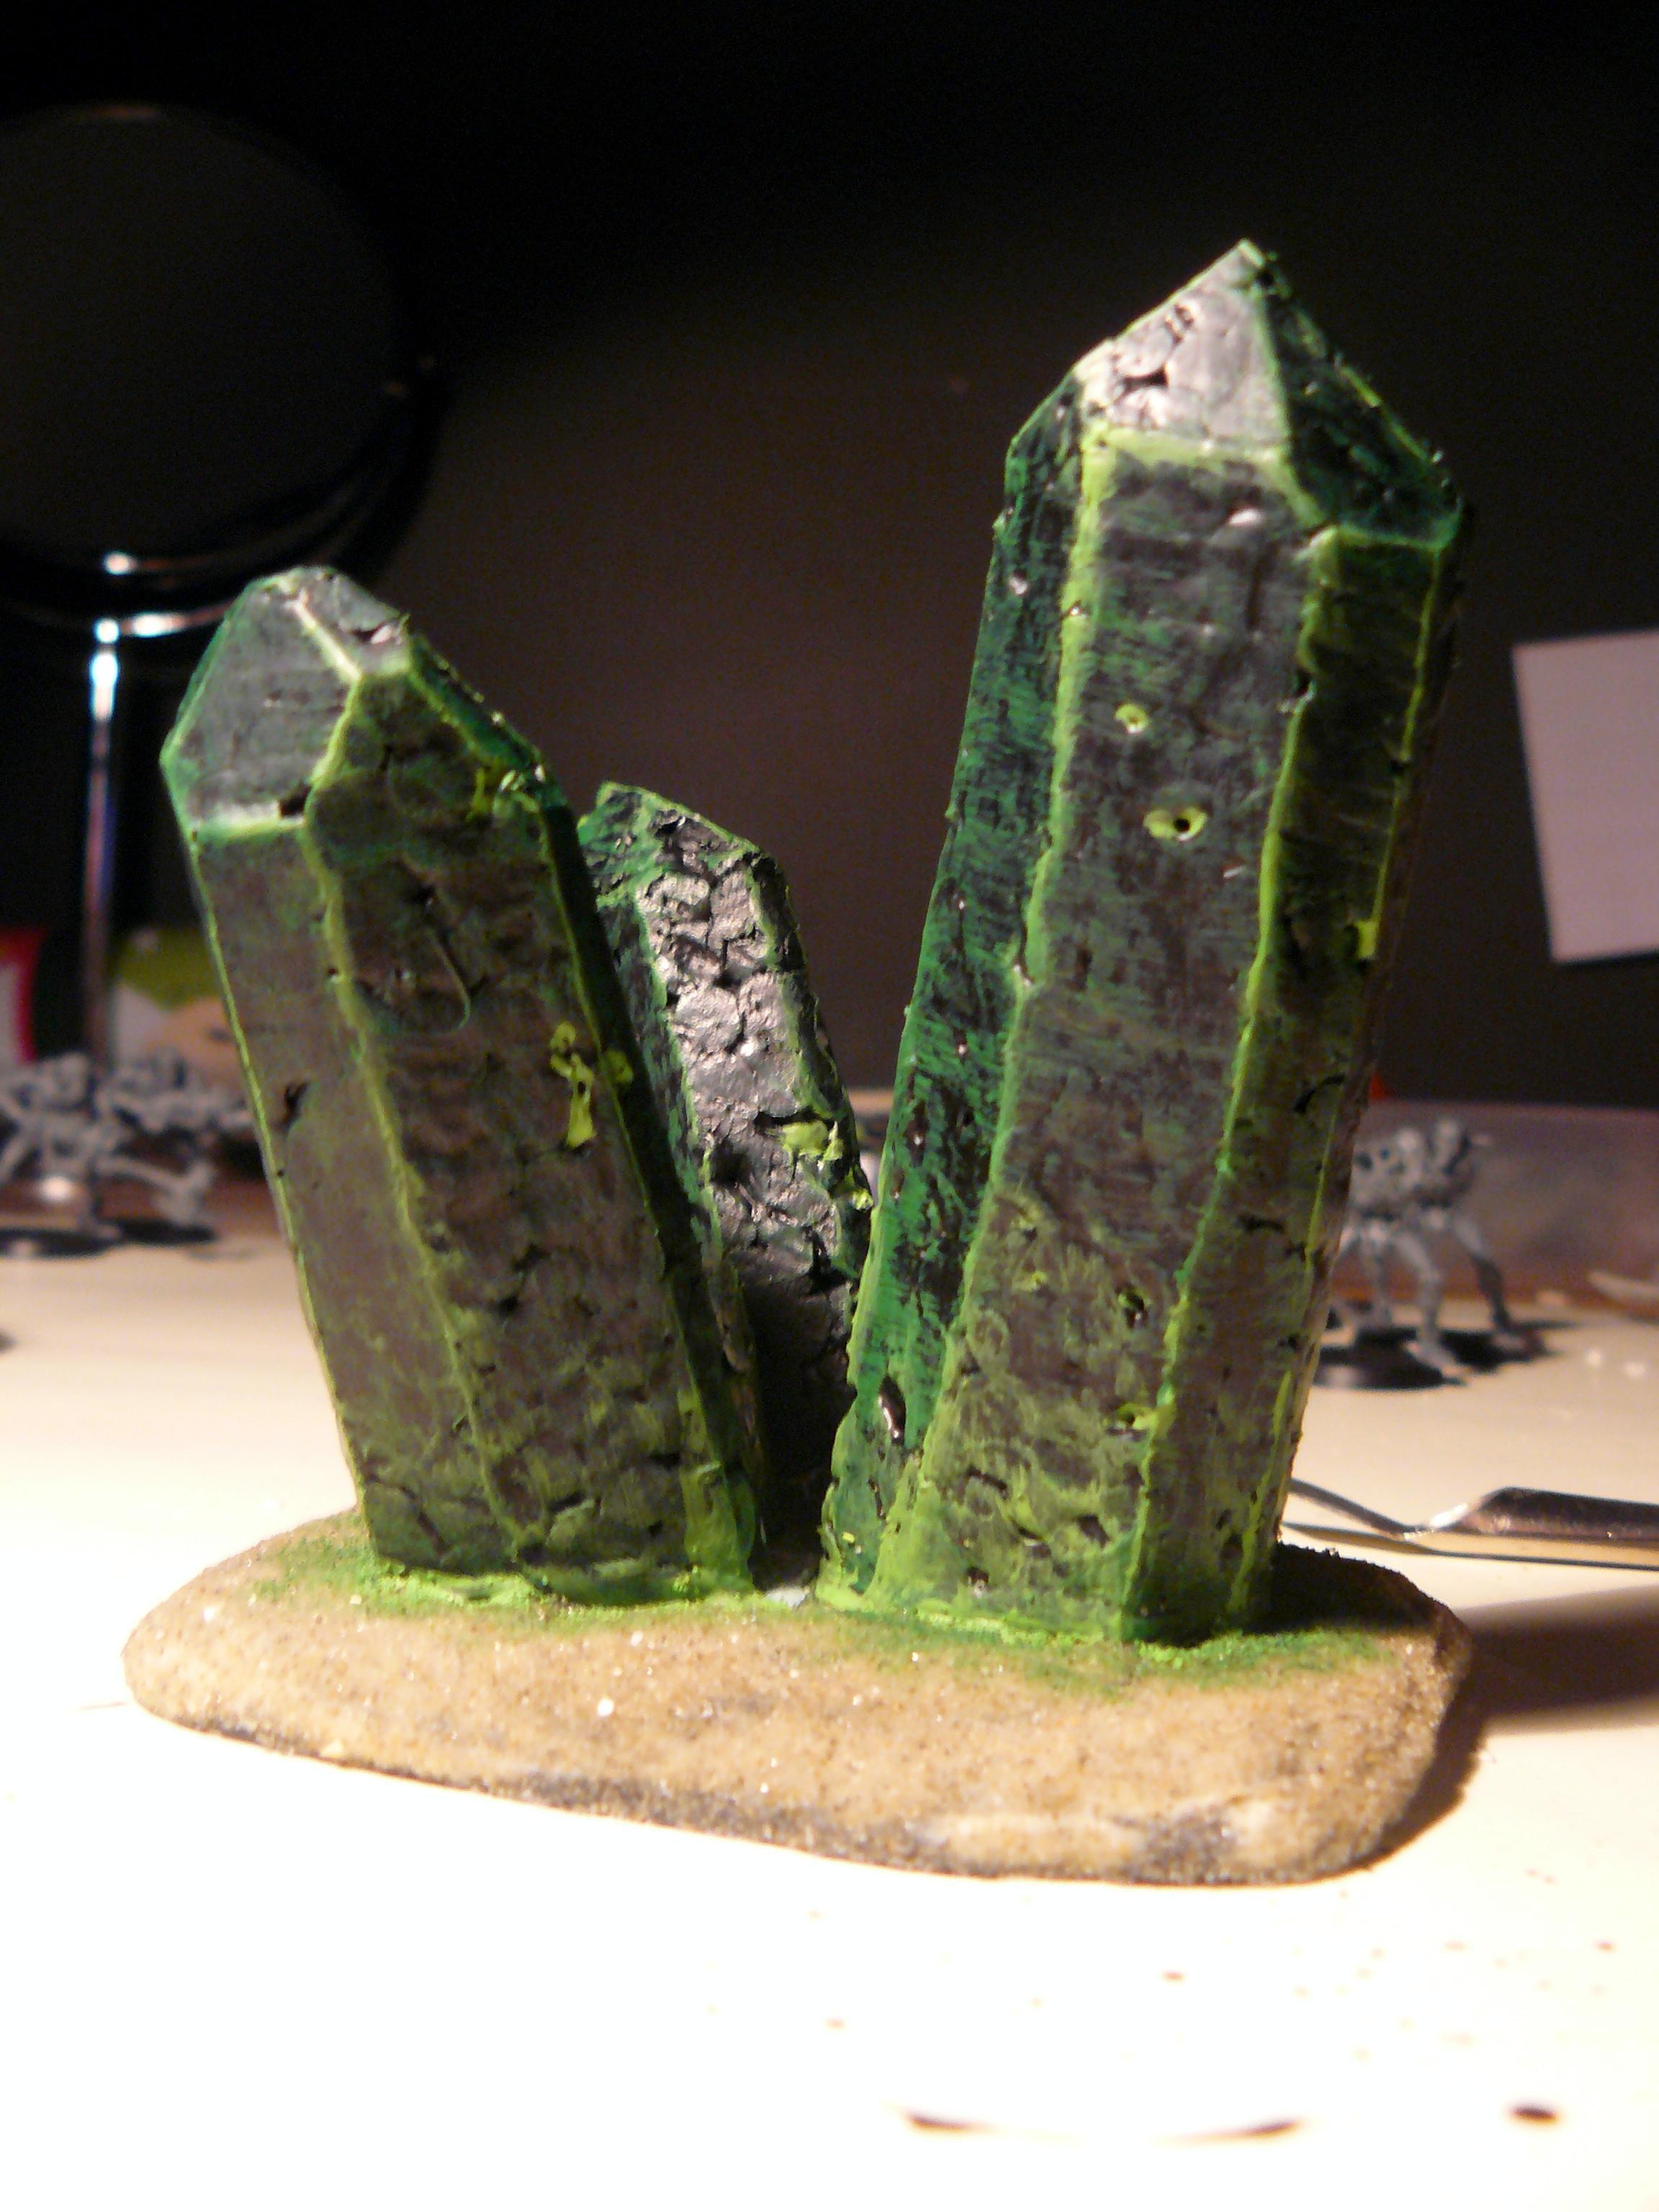 Crystal, Terrain, necron crystals (back)